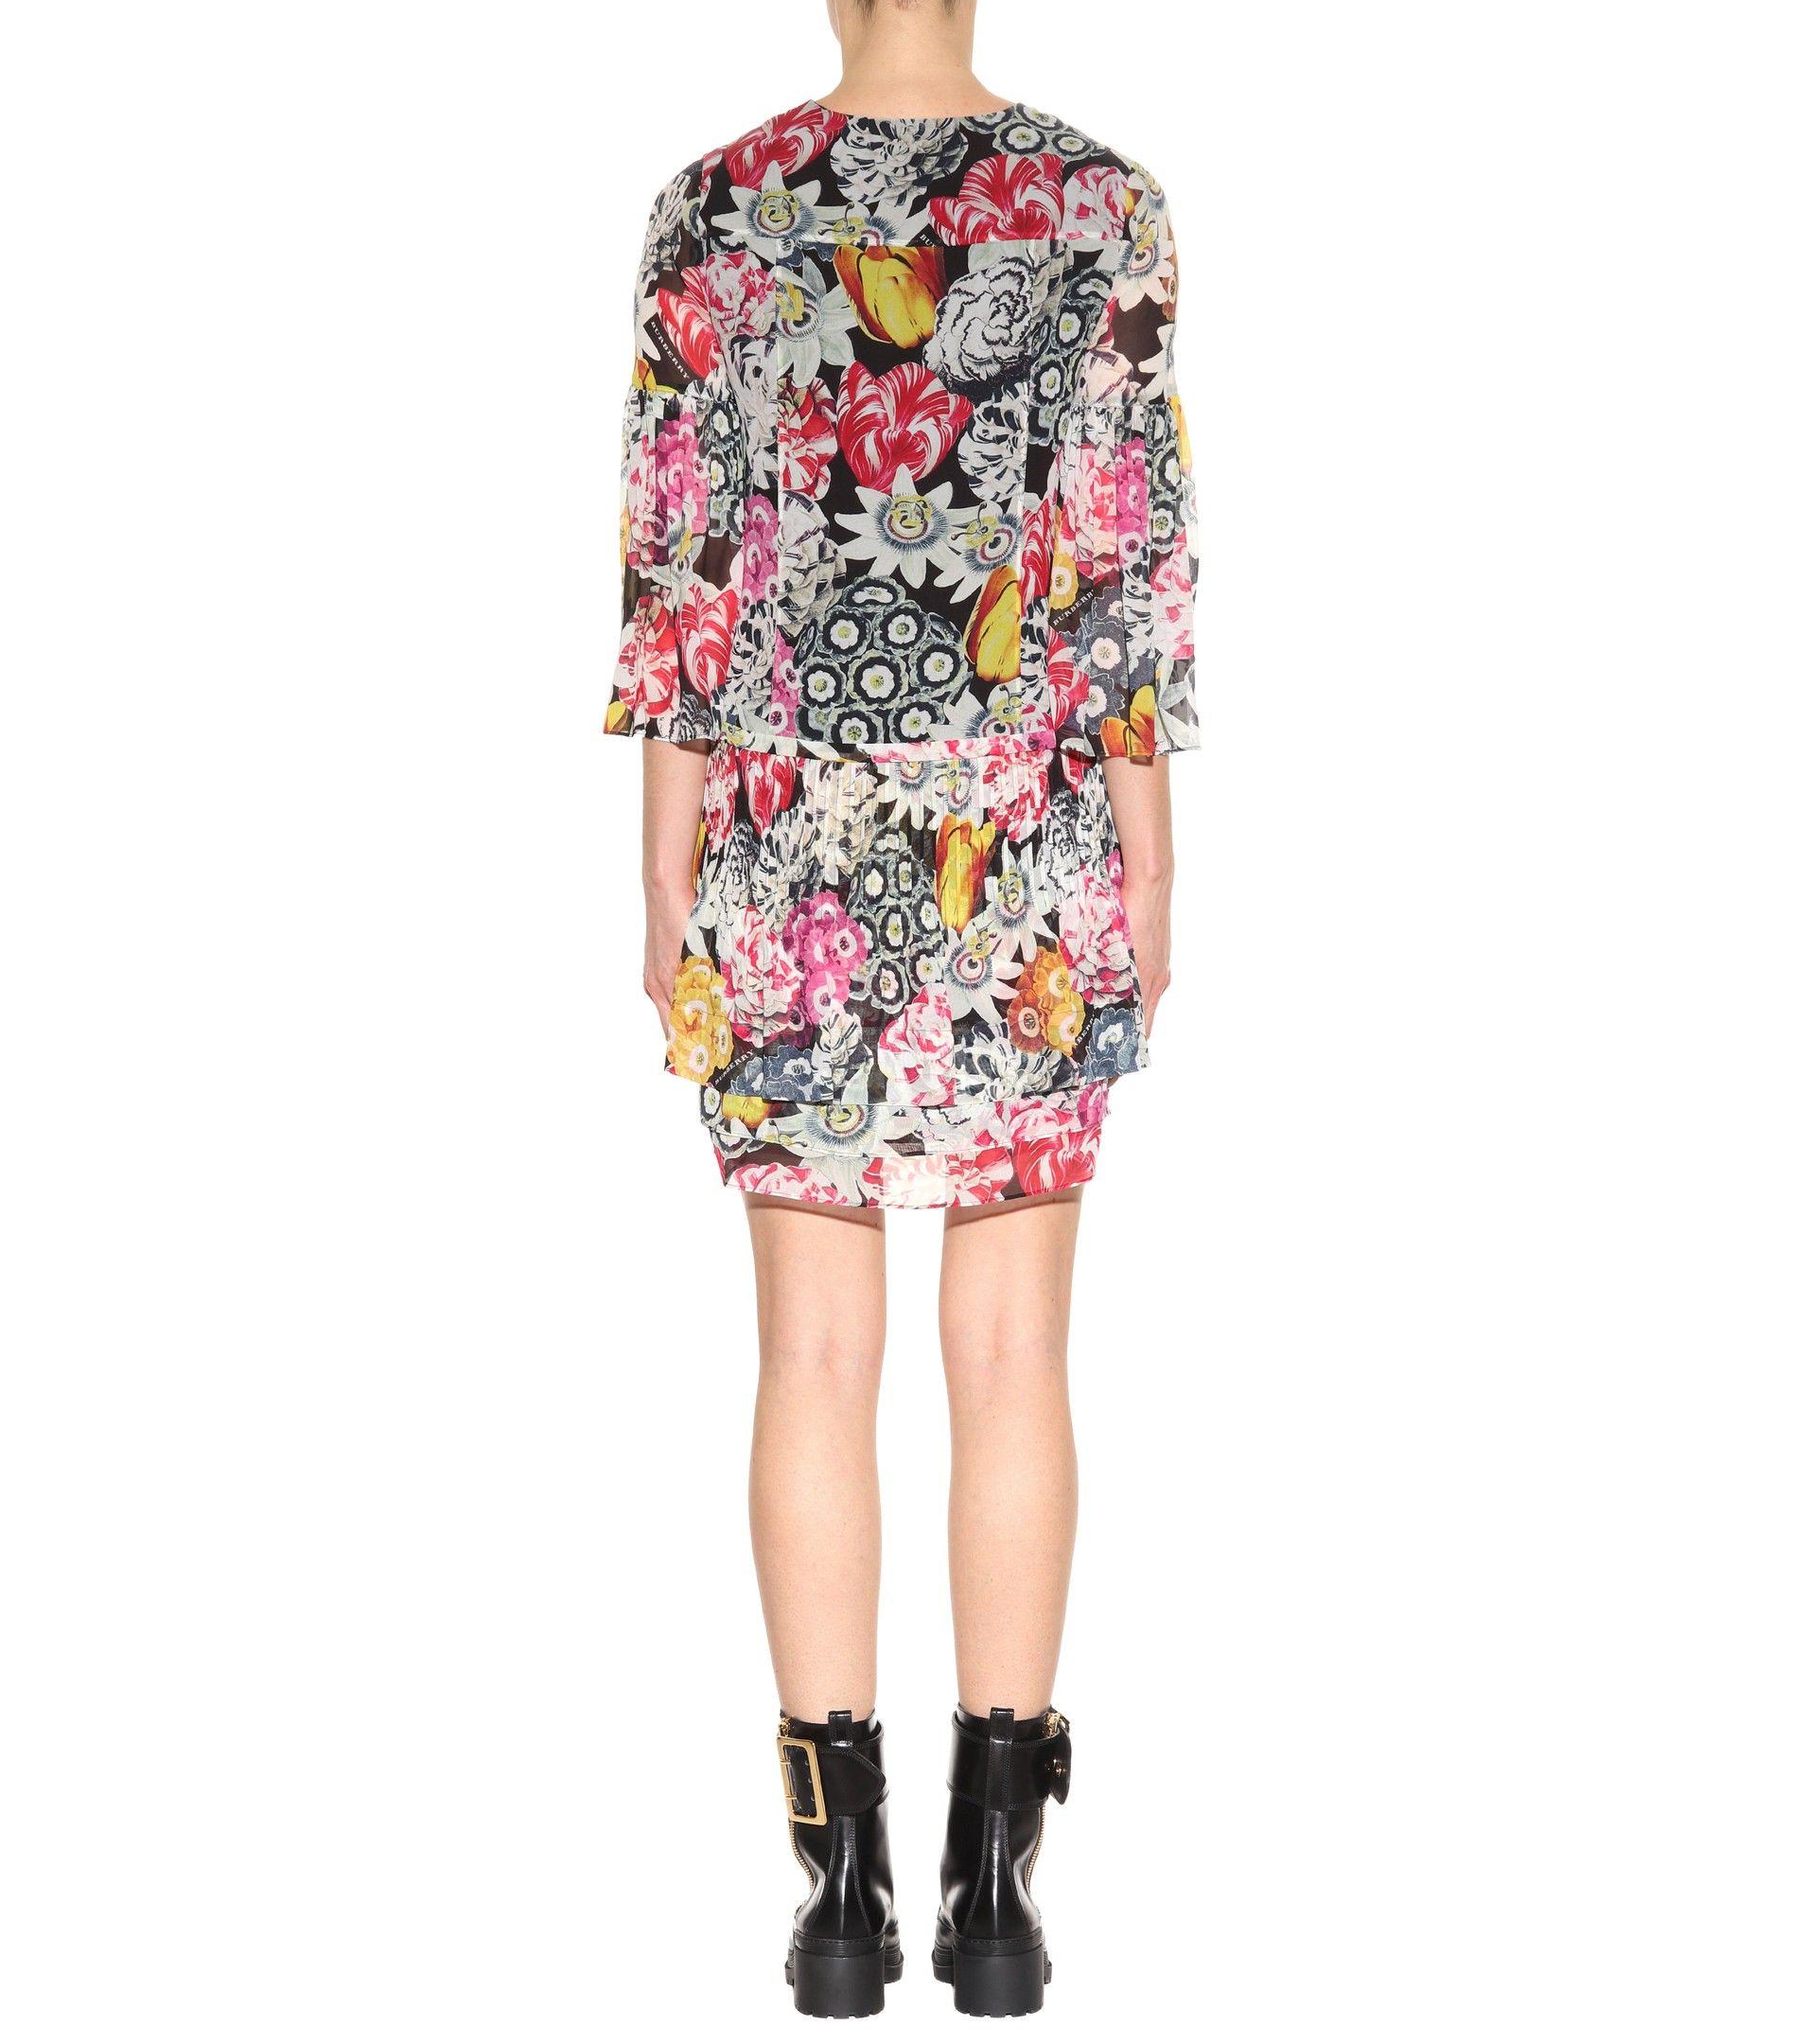 72eb97eb9210 mytheresa.com - Ruth Silk Mini Dress | Burberry - mytheresa - Luxury Fashion  for Women / Designer clothing, shoes, bags